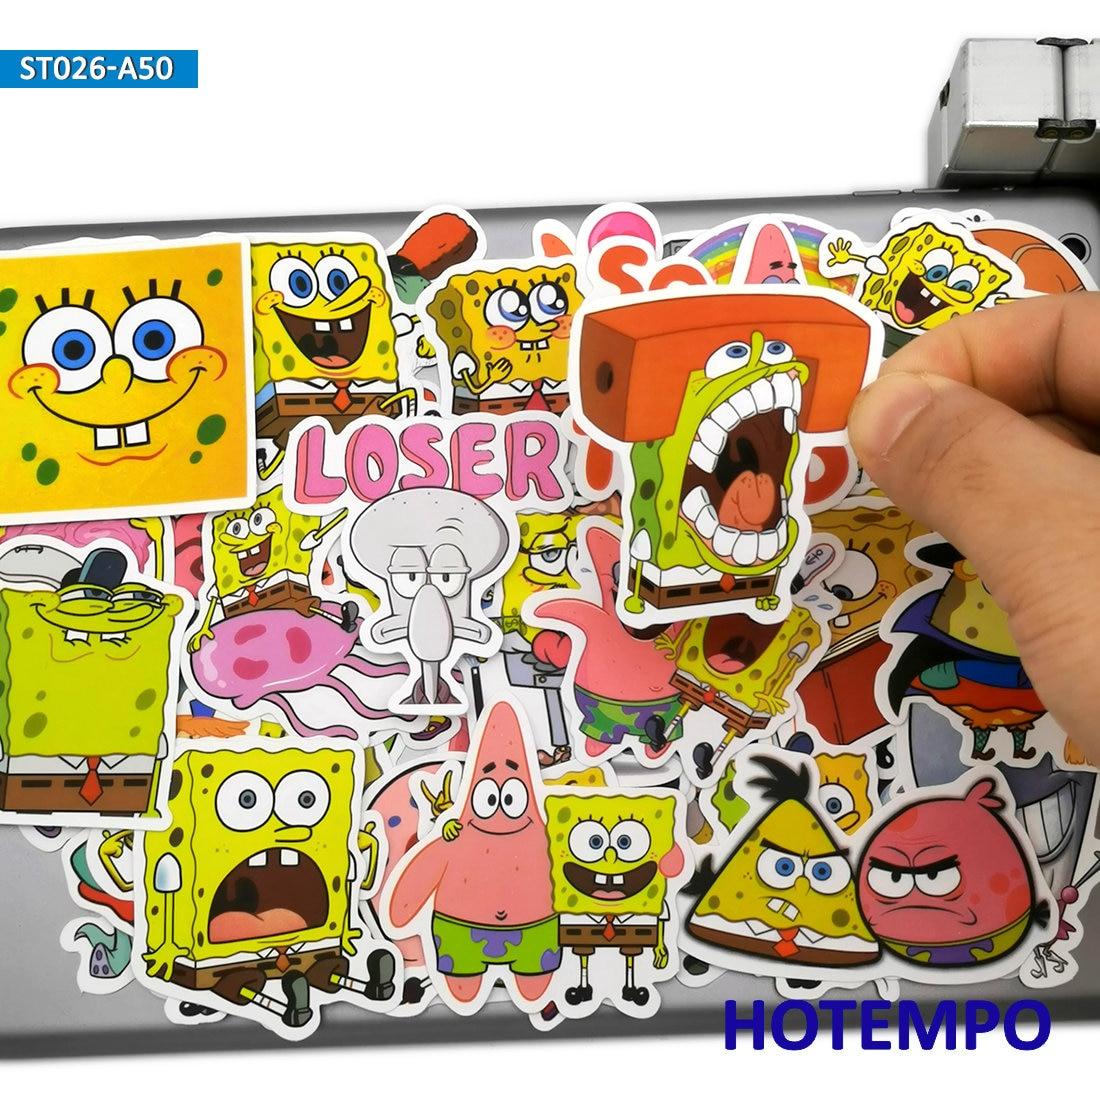 50pcs Cute Yellow Sponge SquarePants Fun TV Cartoon Stickers Toys For Mobile Phone Laptop Luggage Skateboard Anime Decal Sticker